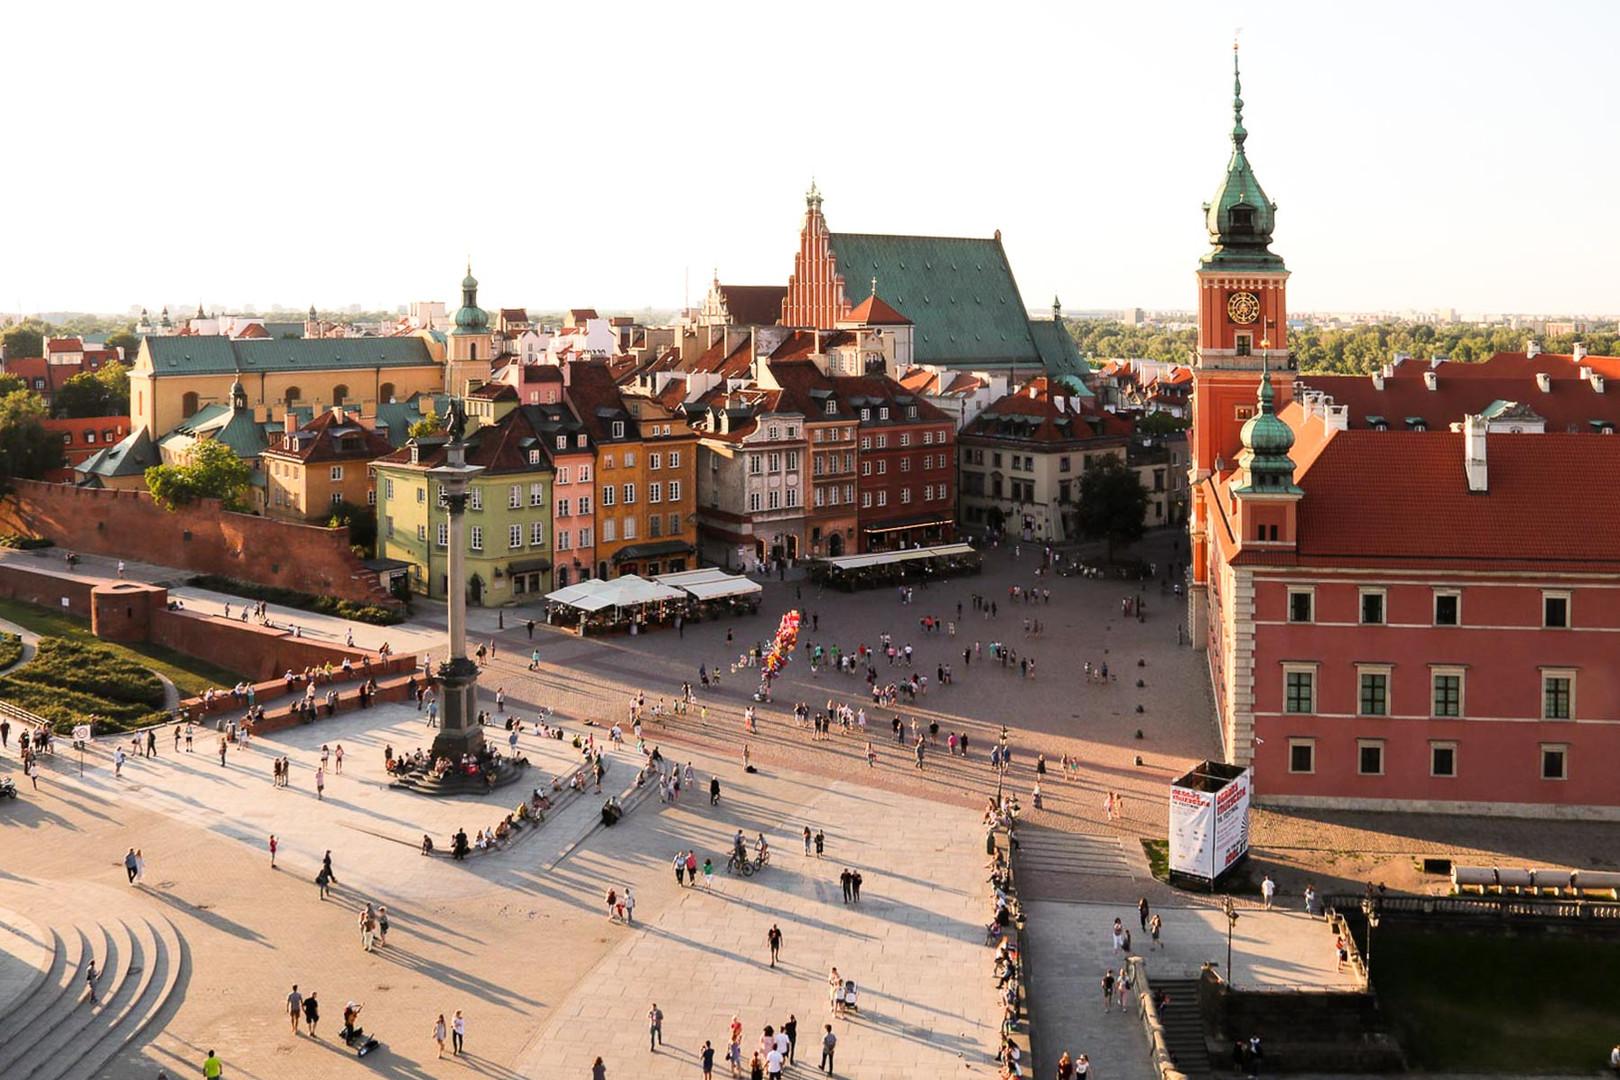 Warsaw, 2018